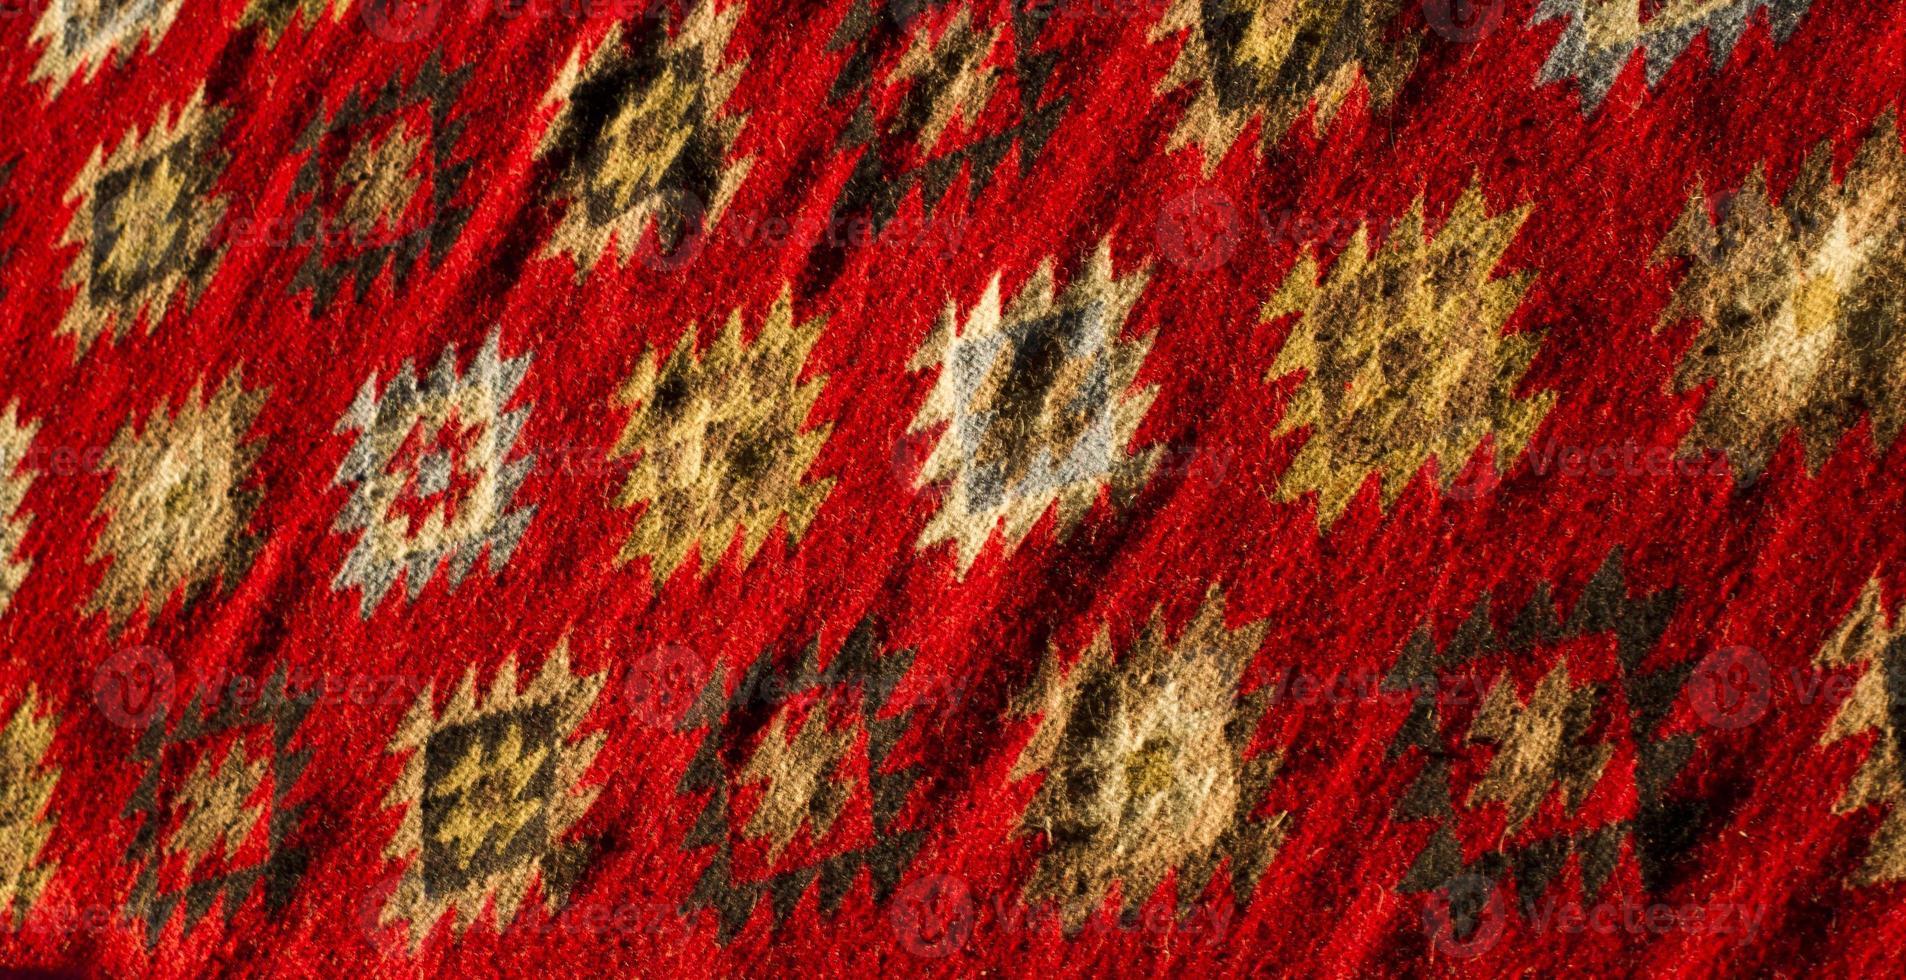 alfombra colorida foto